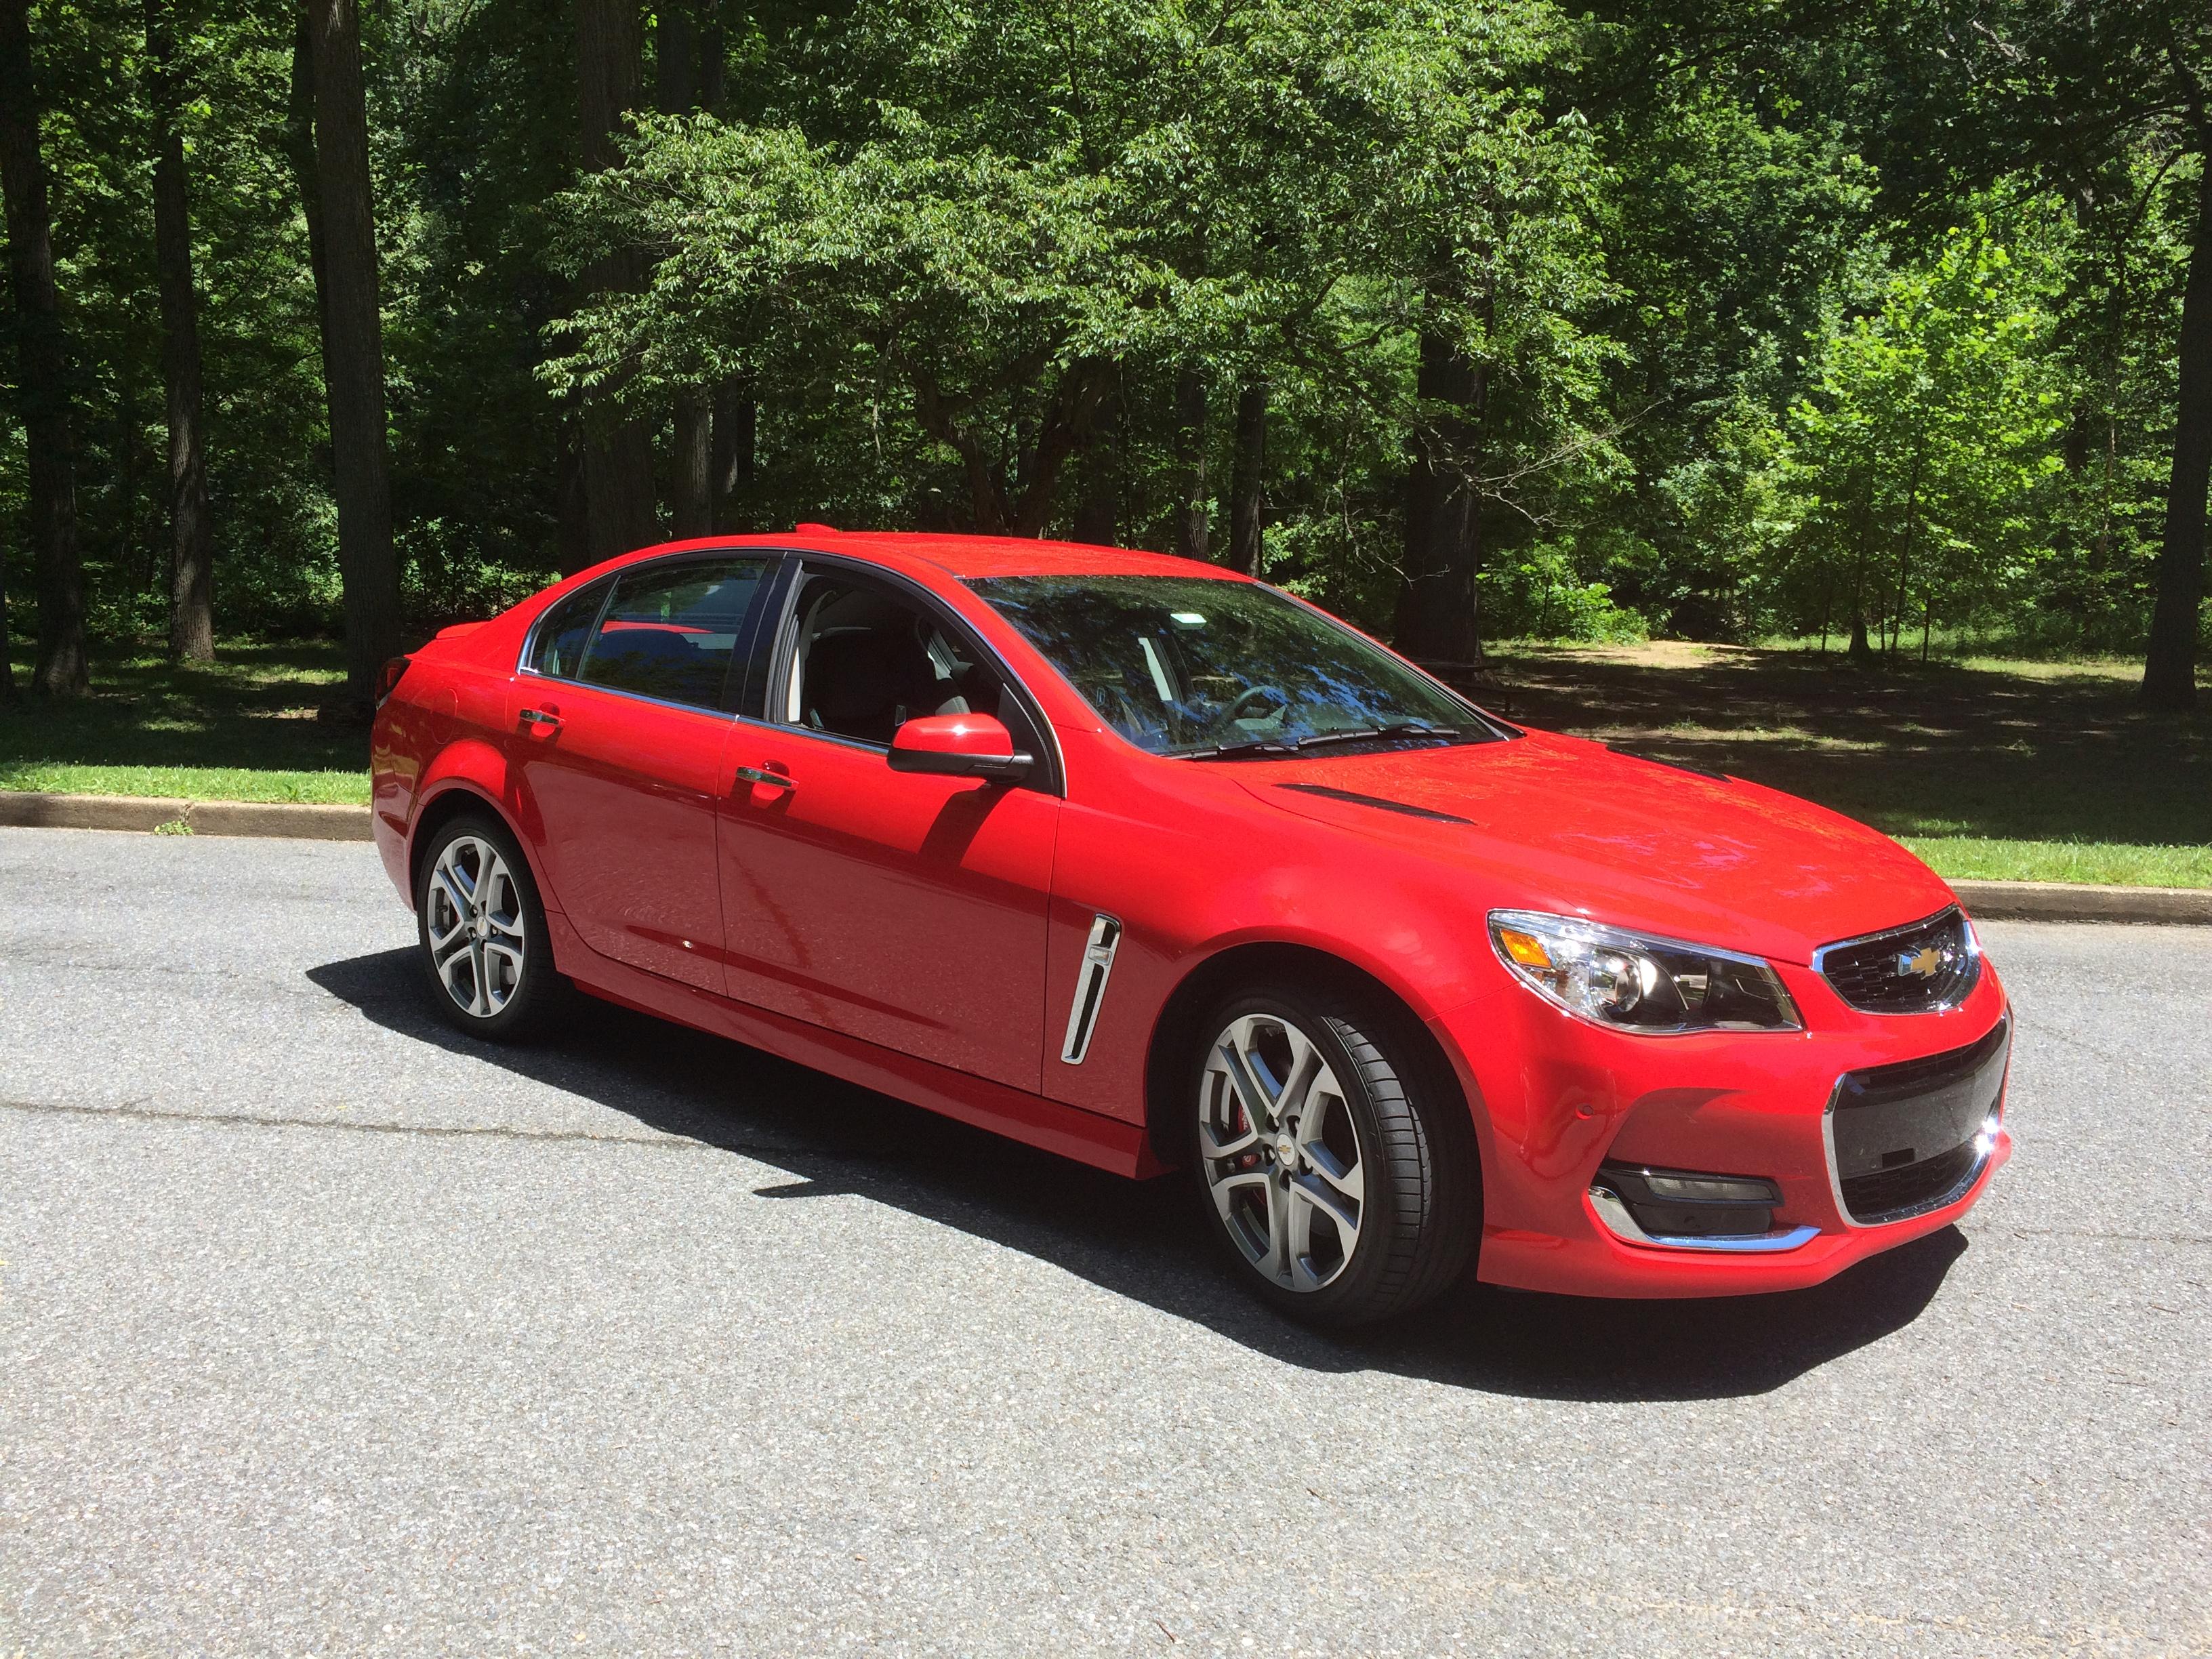 Chevrolet SS: A fun-to-drive V8 sedan   WTOP